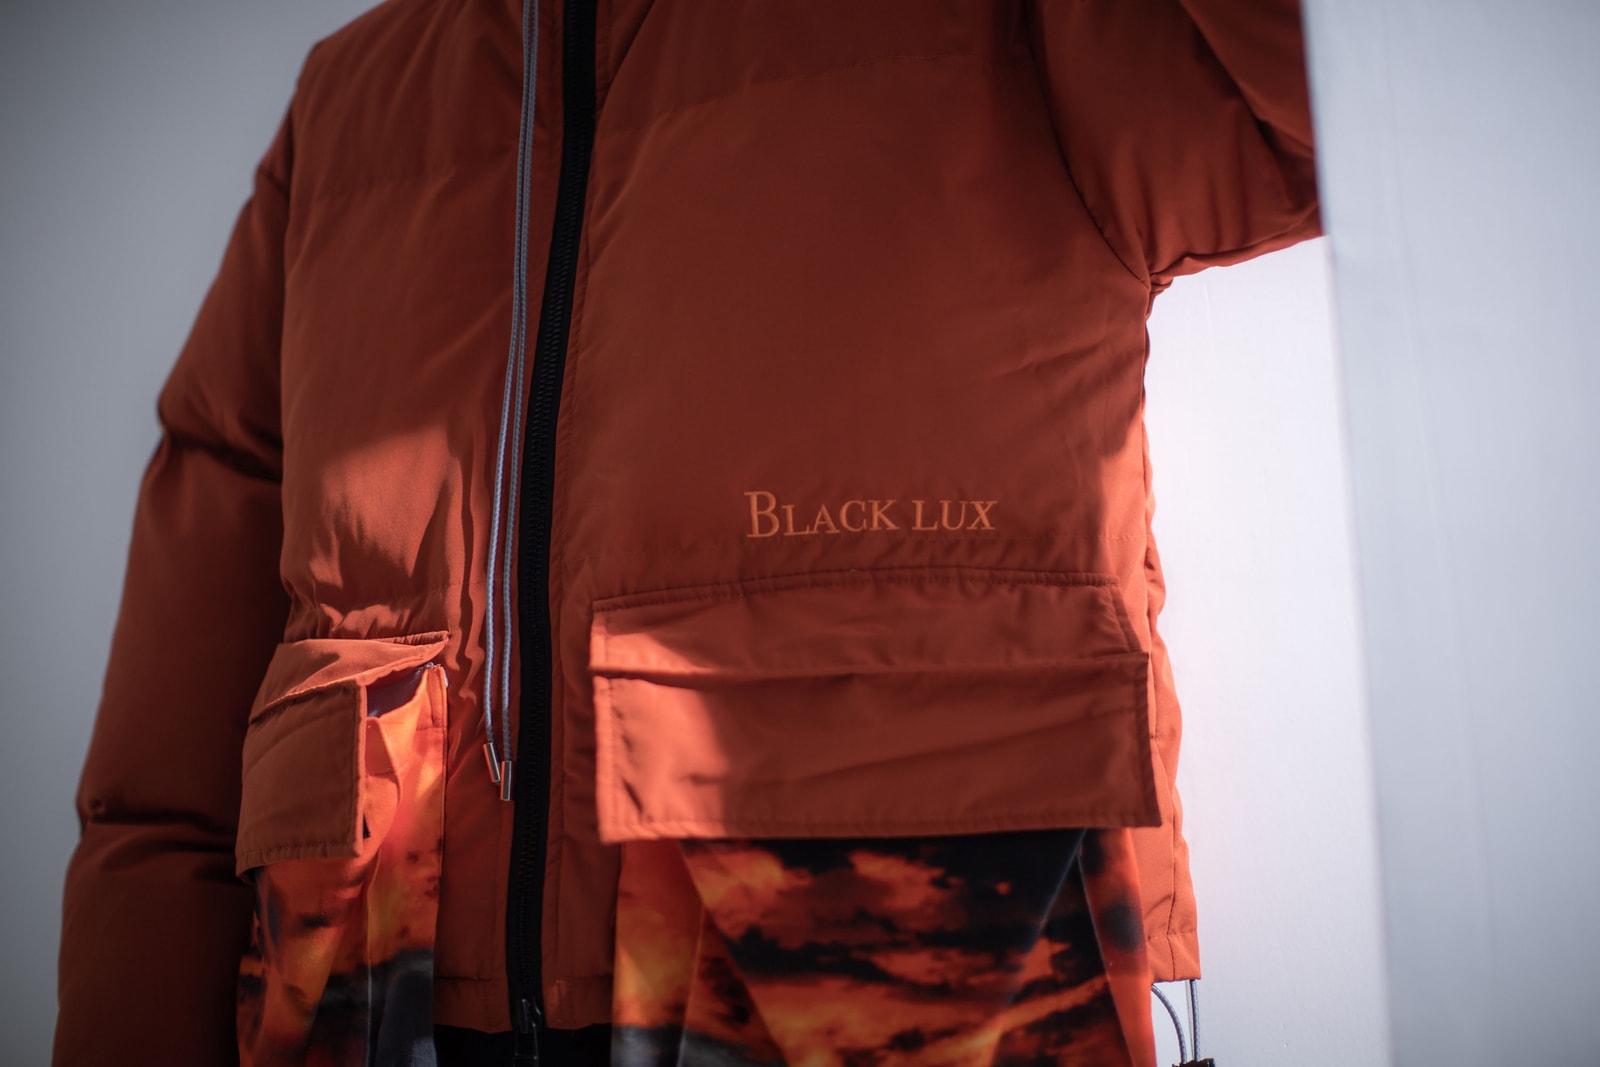 BLACKLUX发布 2020 秋冬「Vitality & Hope PT.2」系列 Lookbook